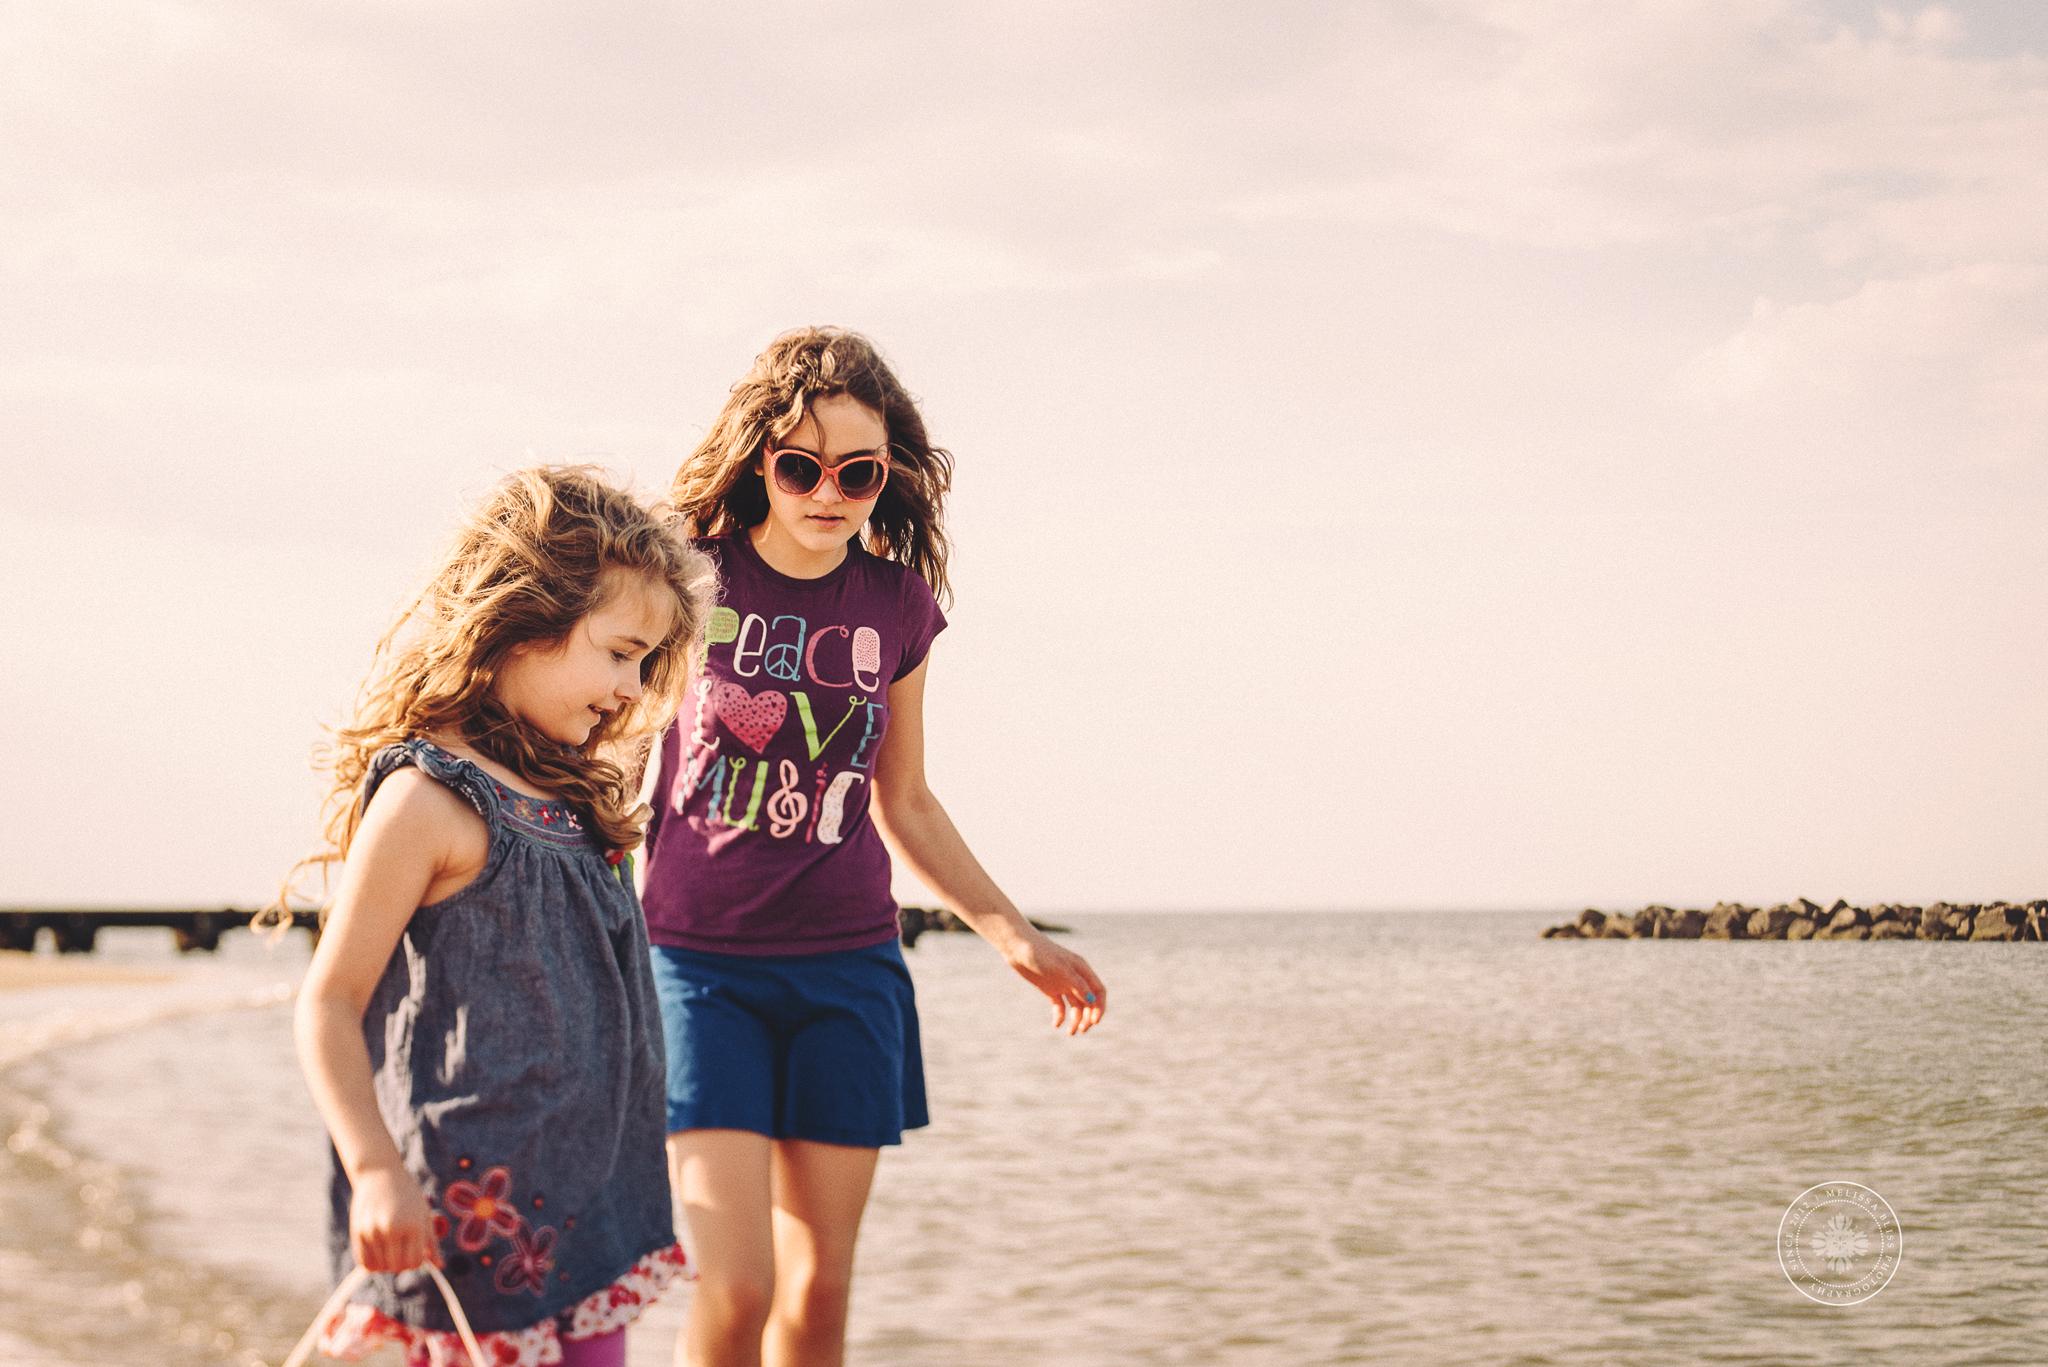 documentary-photographer-virginia-beach-sandbridge-va-melissa-bliss-photography-girls-walking-shore